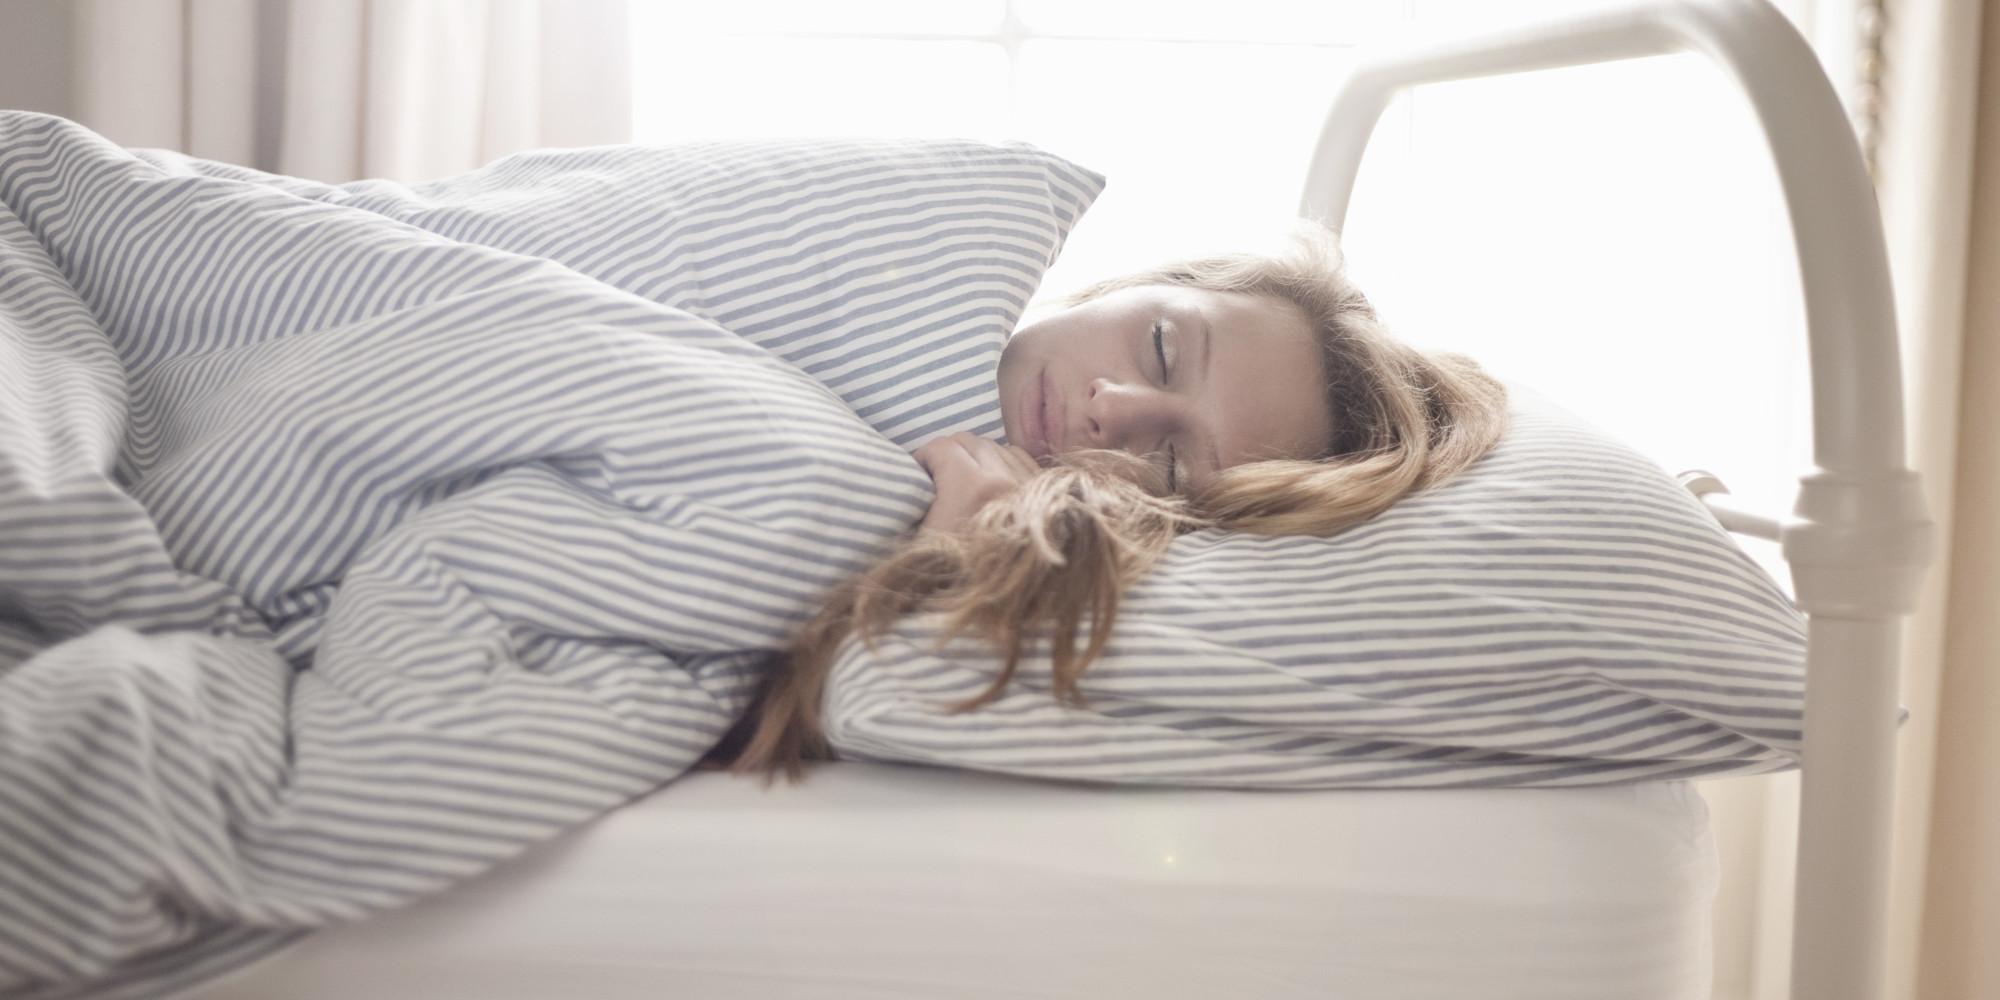 Sleep researchers is that teen their behavior